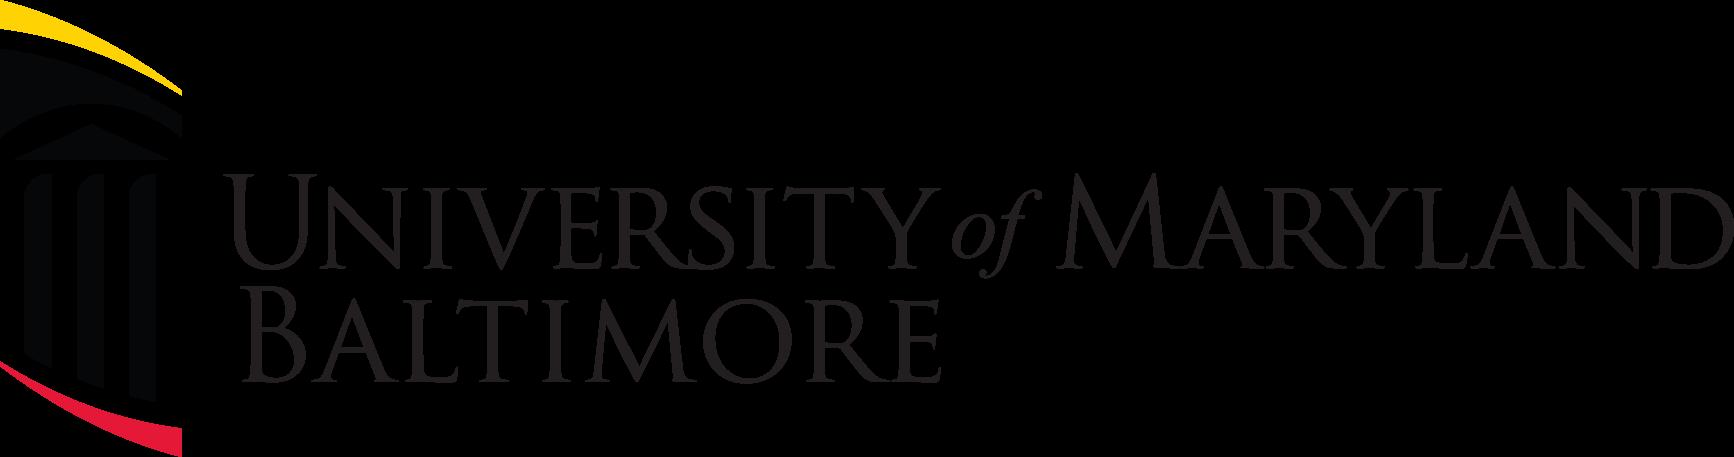 University of Maryland, Baltimore logo